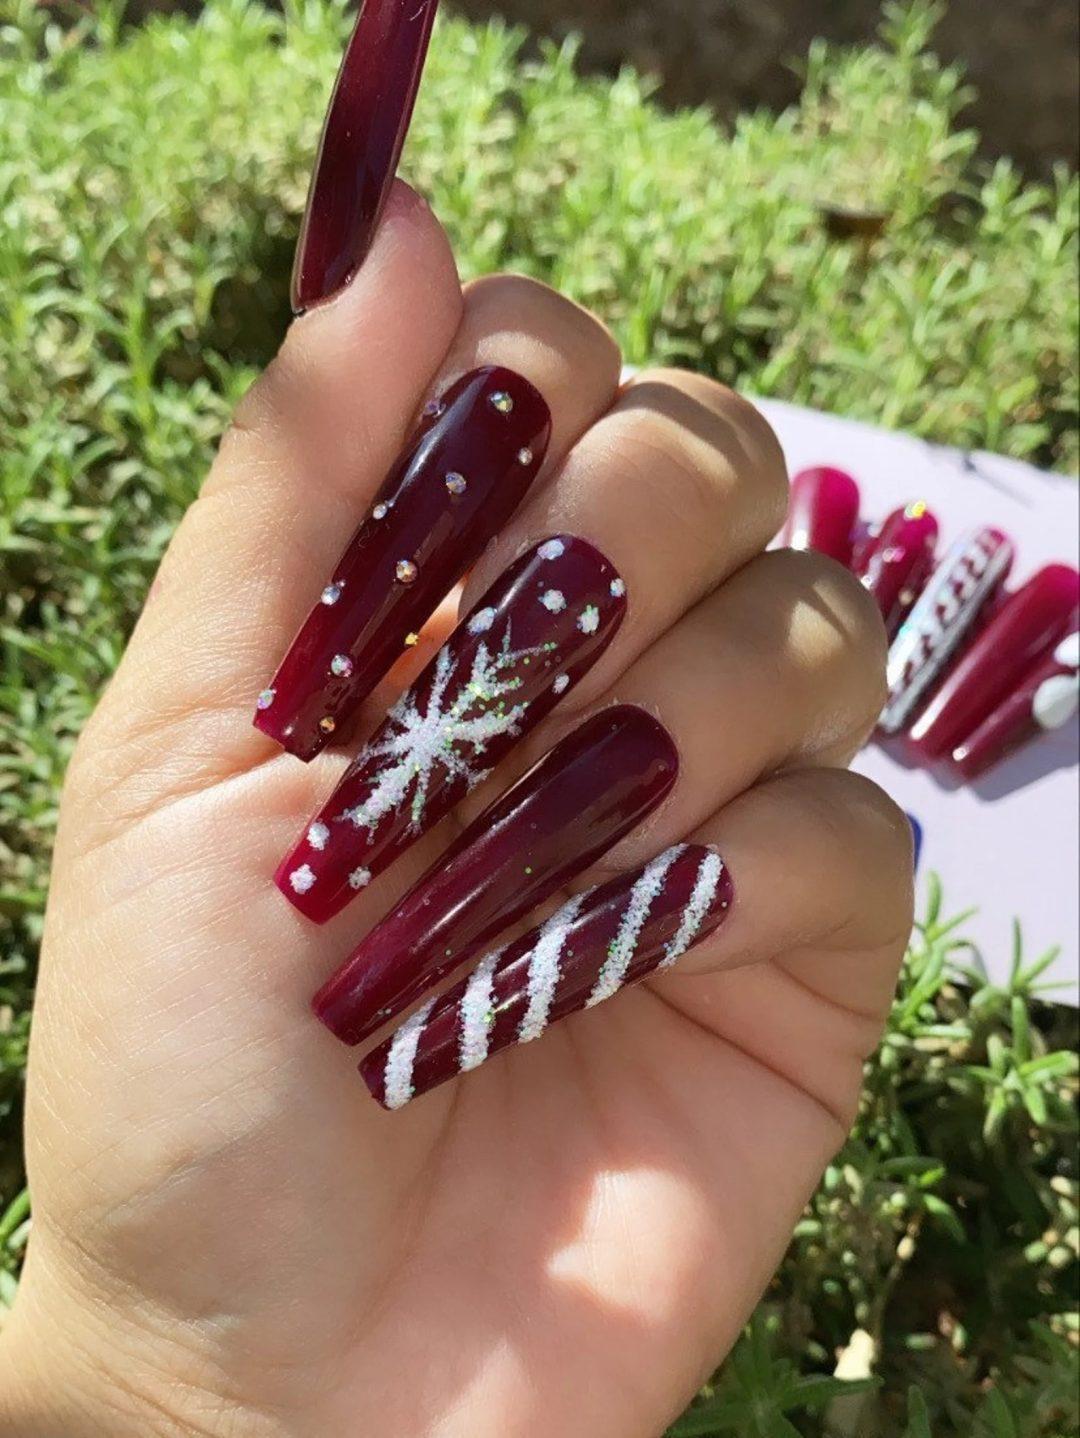 Maroon and white snowflake nails